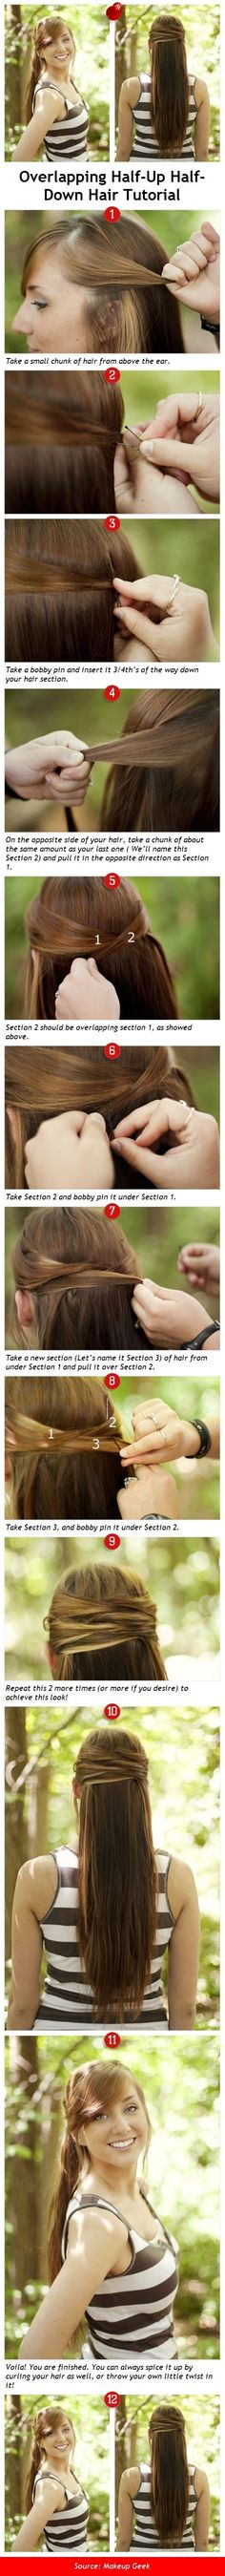 Half-up Half-down Hairstyles & Hair Tutorials for Women overlapping half-up half-down hair tutorial .overlapping half-up half-down hair tutorial . Diy Hairstyles, Pretty Hairstyles, Hairstyle Tutorials, Wedding Hairstyles, Makeup Tutorials, Perfect Hairstyle, Elegant Hairstyles, Everyday Hairstyles, Hair Day